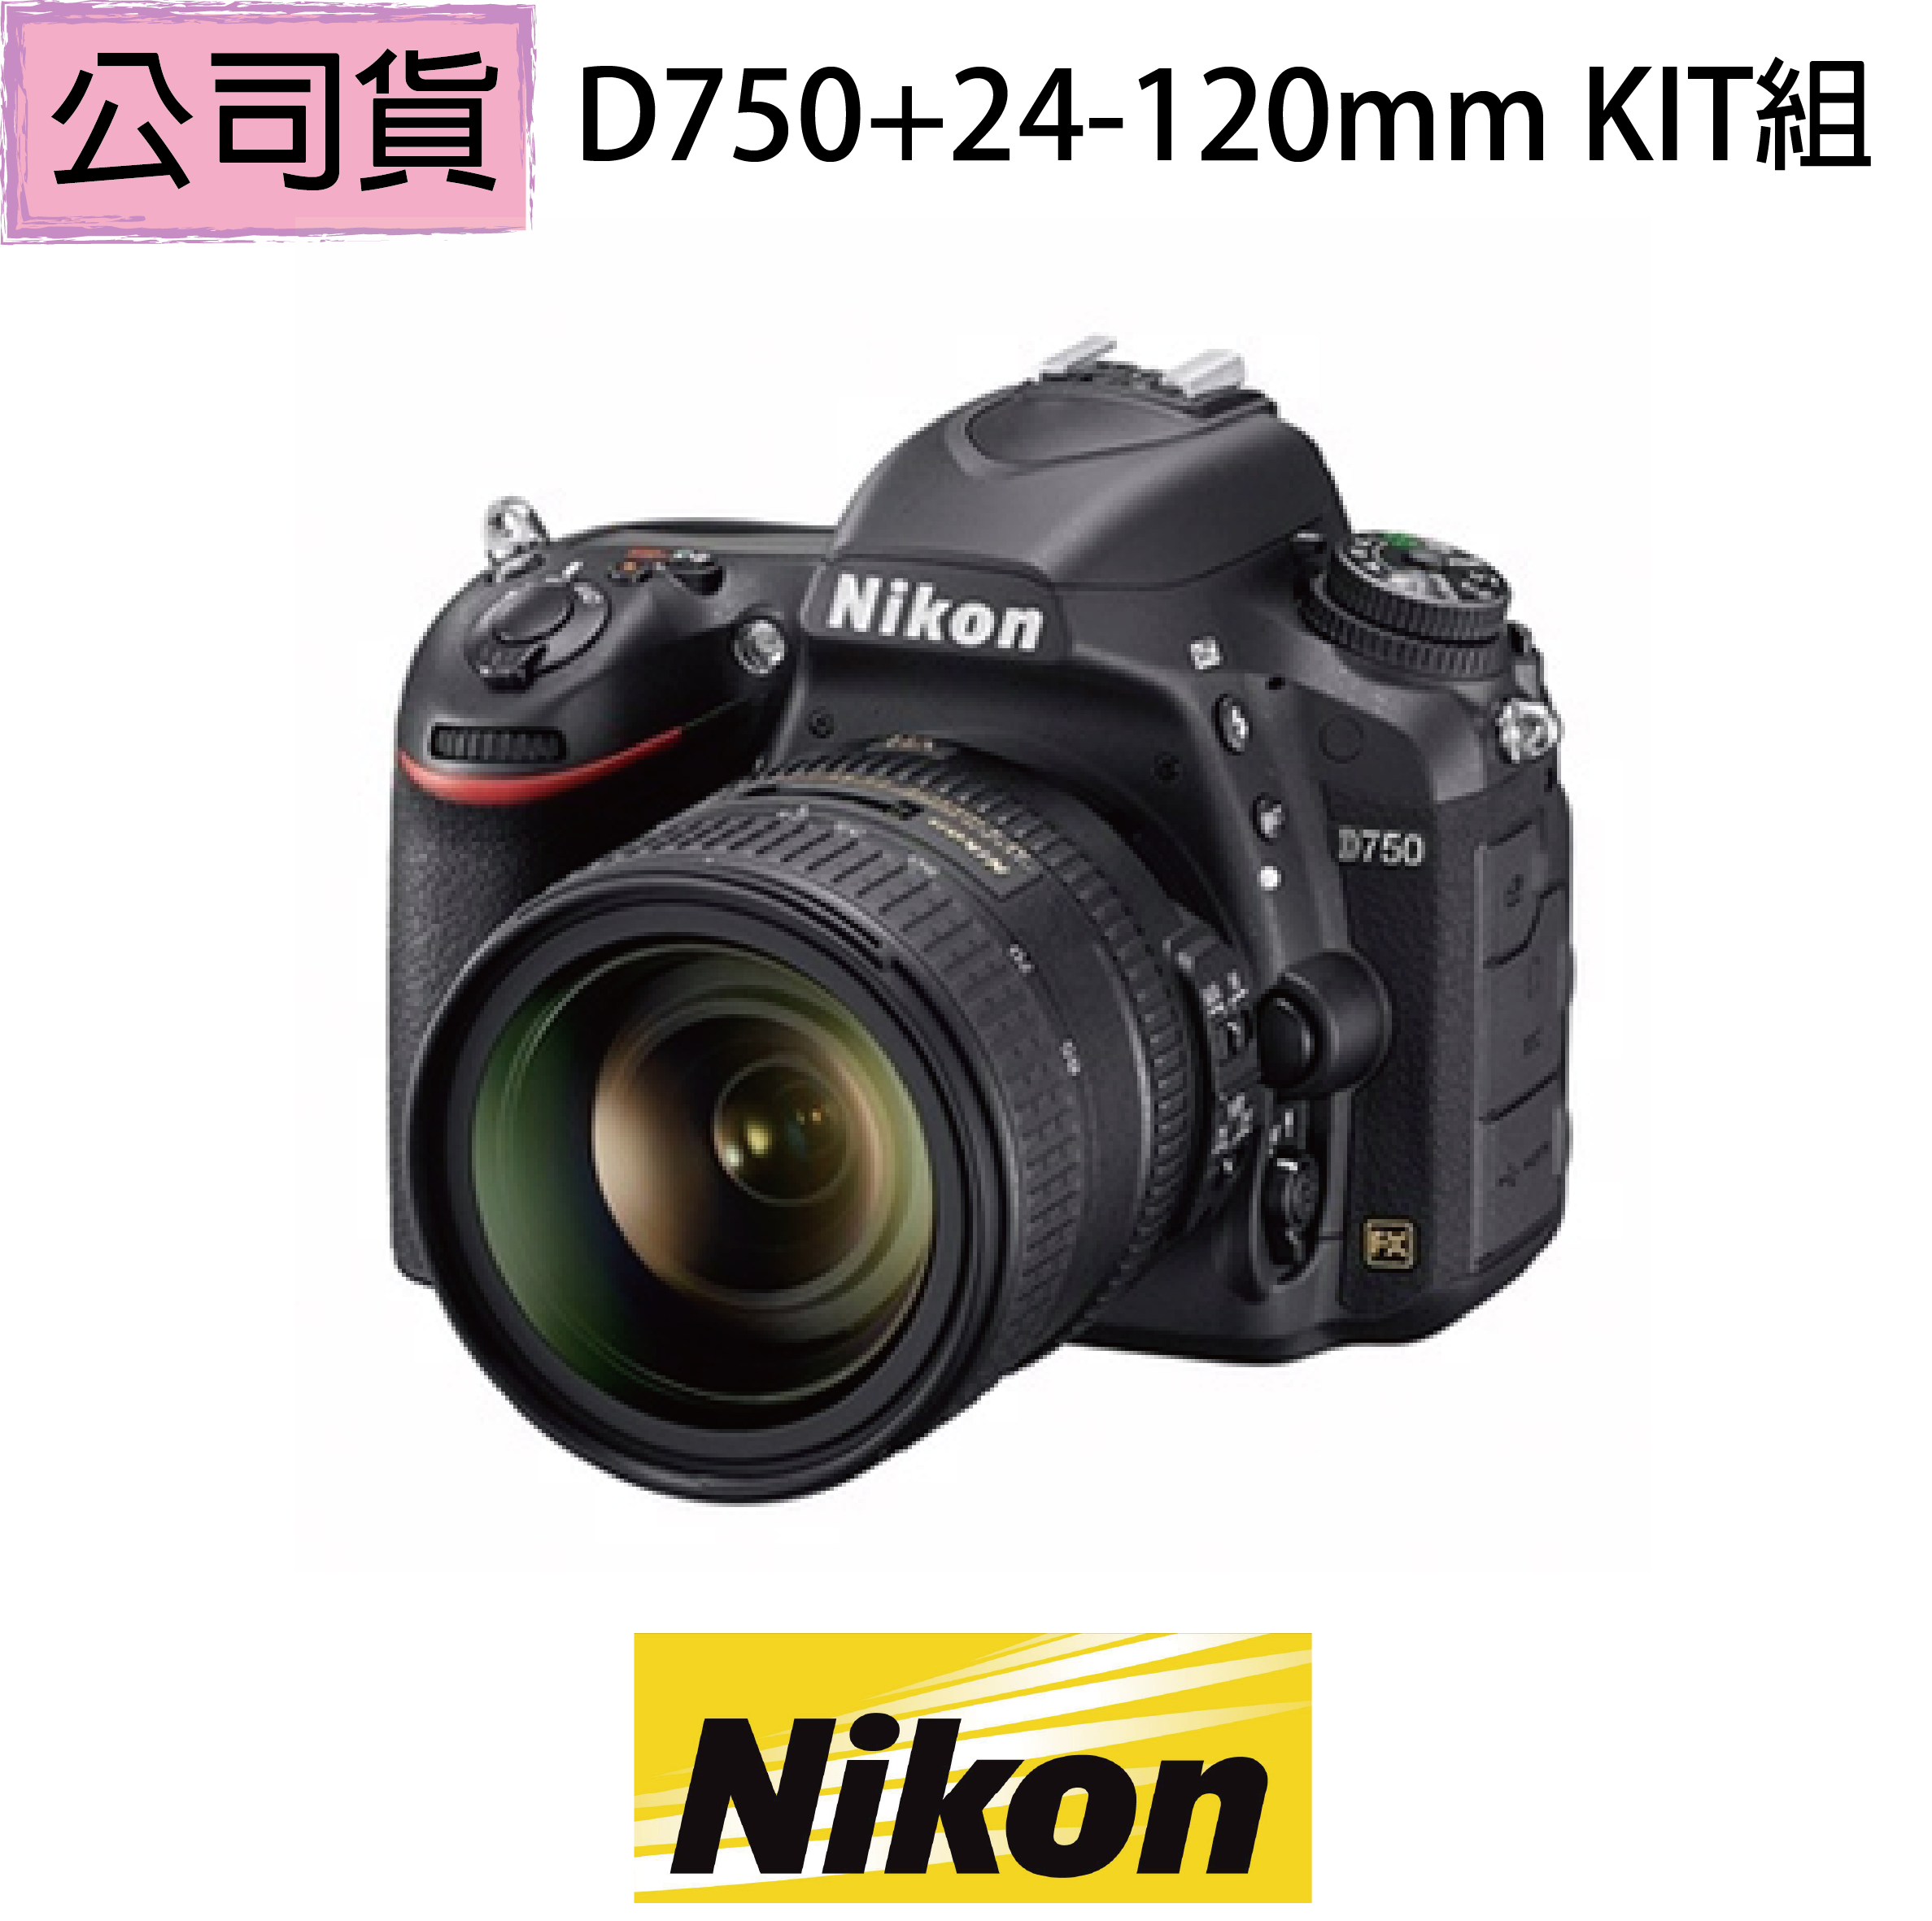 贈【SanDisk 32G 超值組】【Nikon】D750+24-120mm KIT組 (公司貨)▼